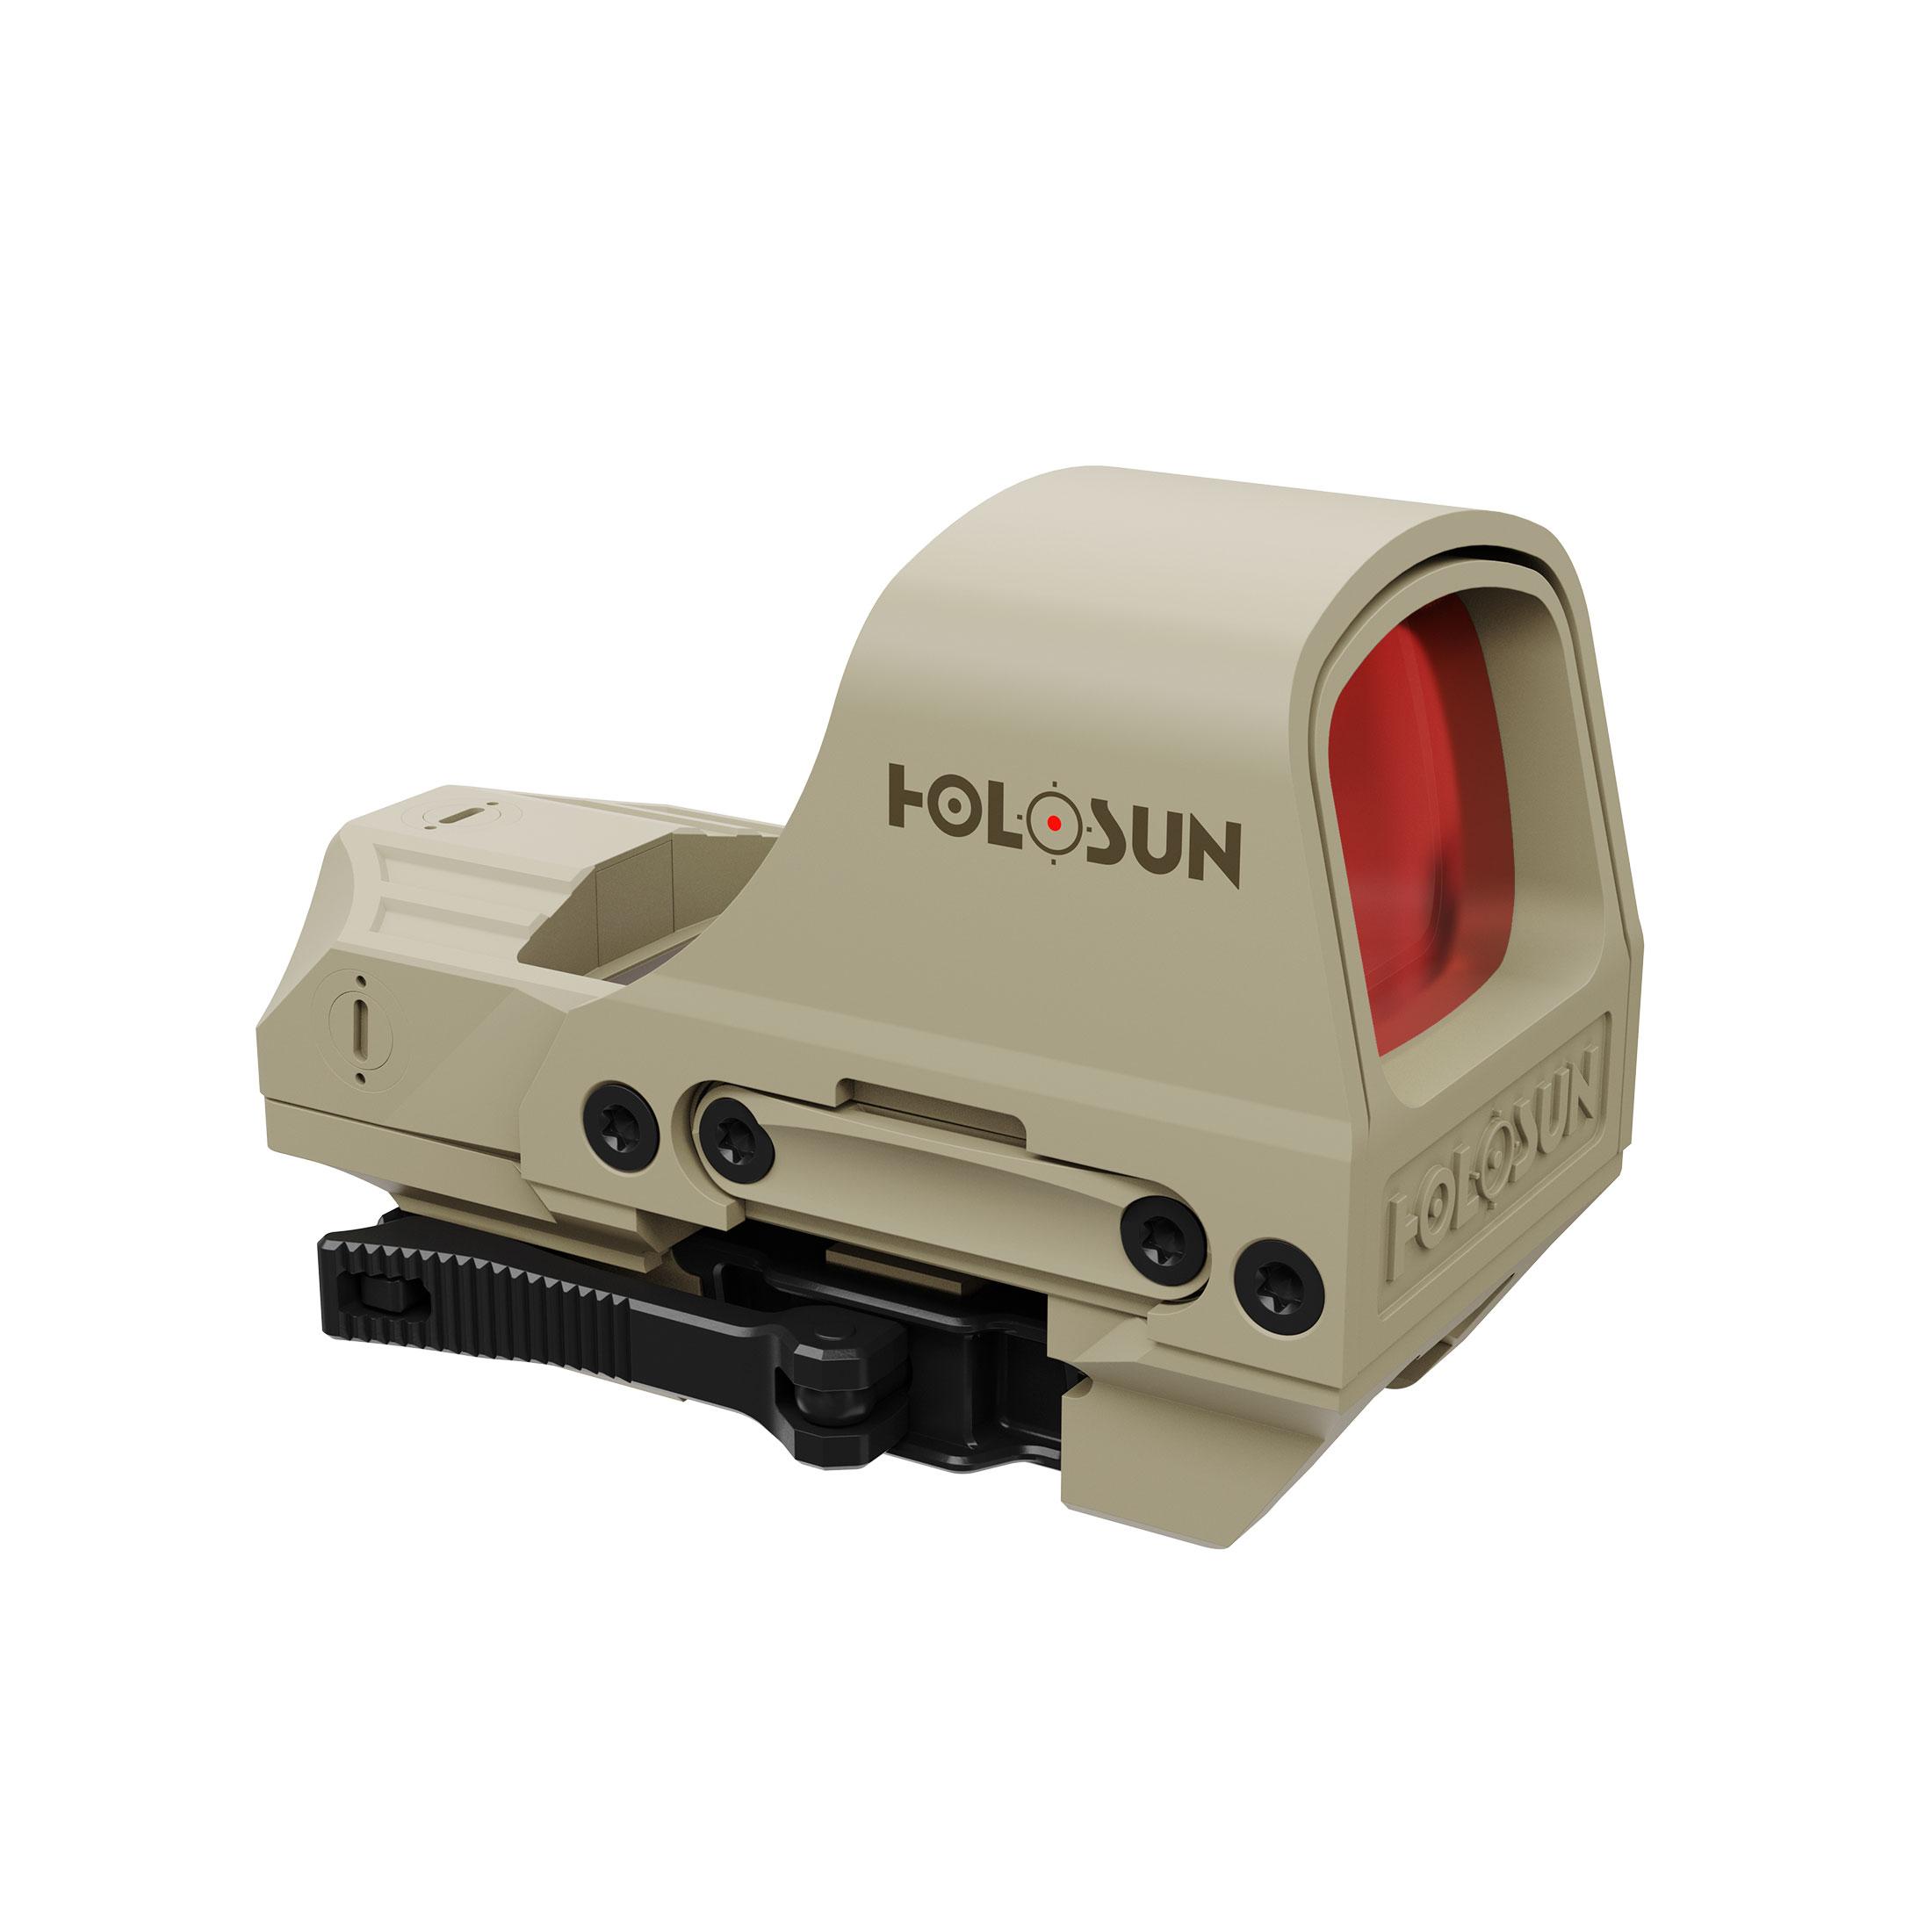 Holosun Dot Sight CLASSIC HS510C-FDE